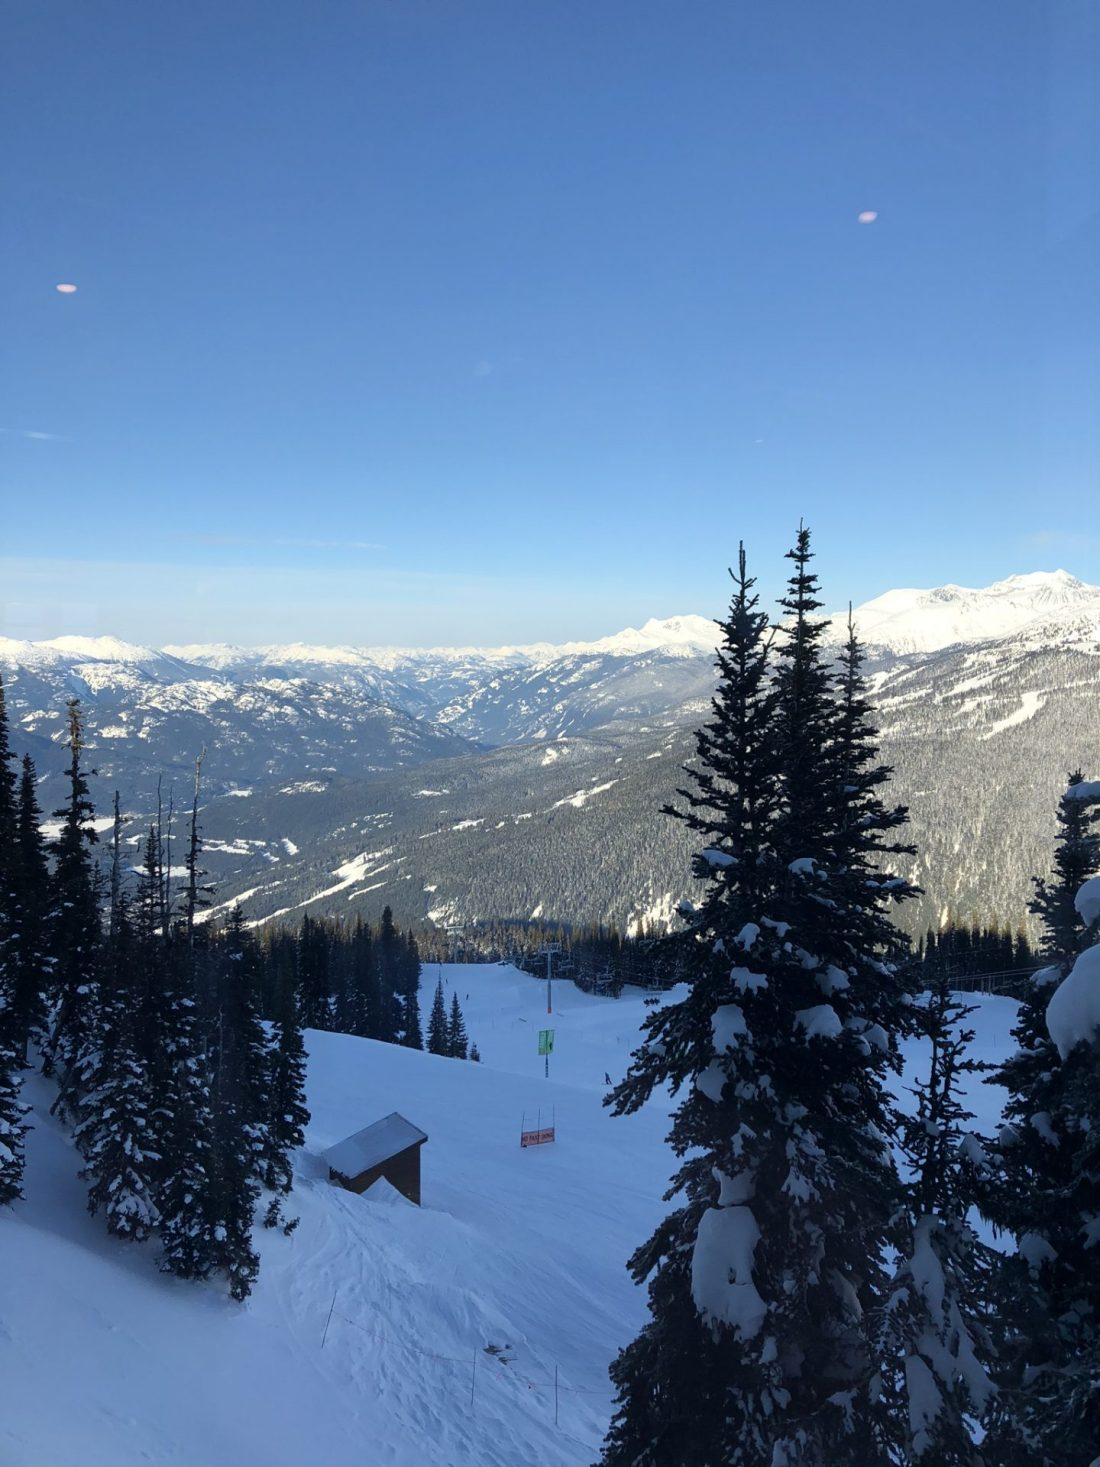 Views over Whistler, British Columbia